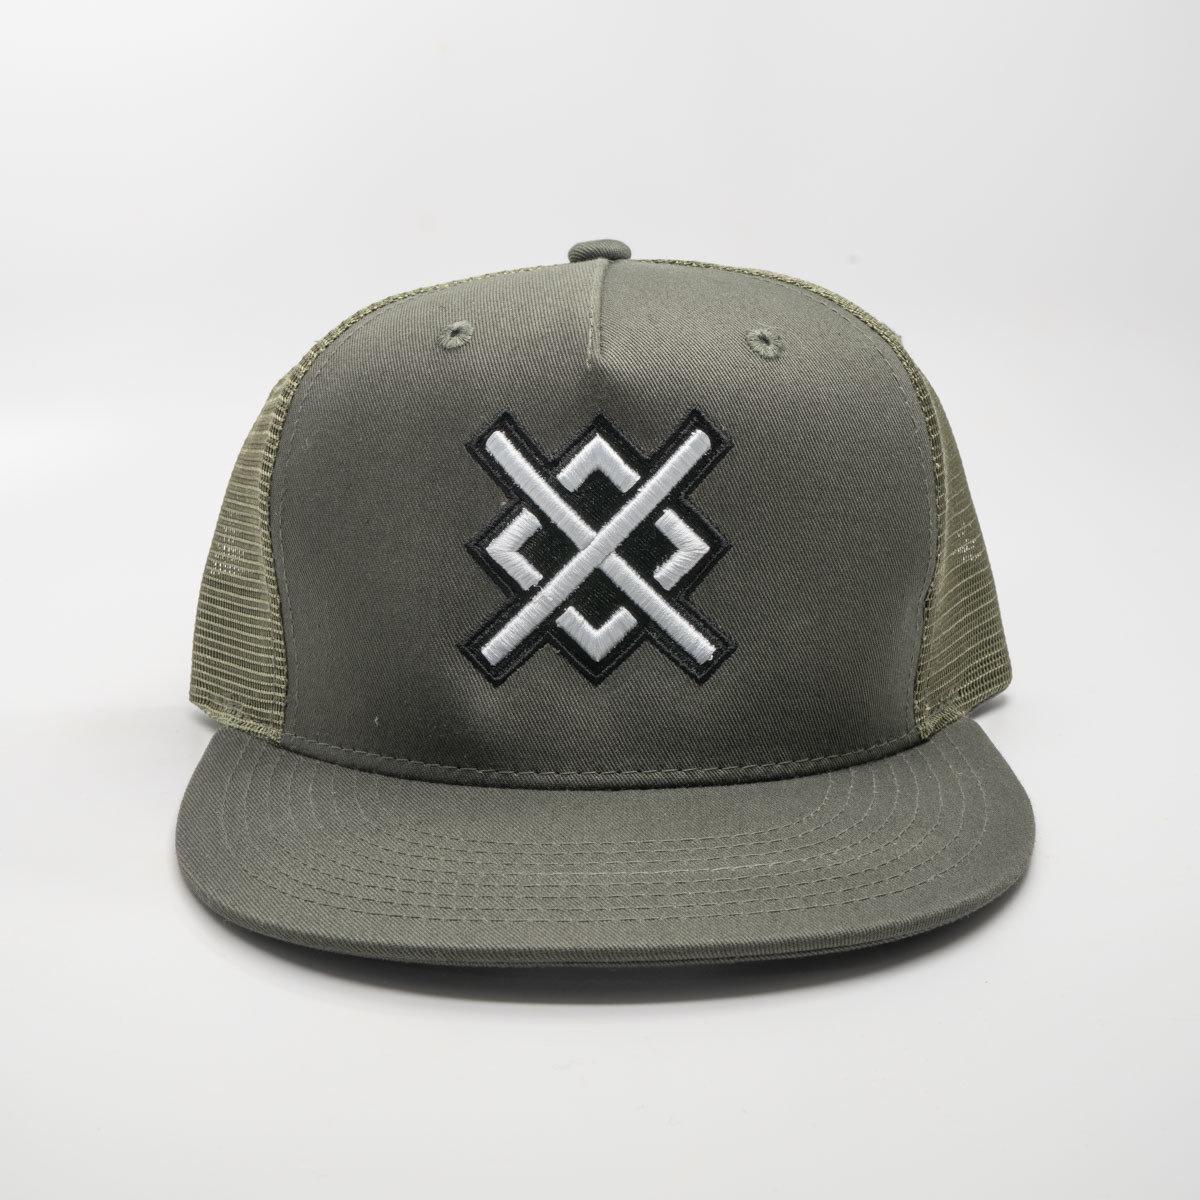 Nardcore Trucker Hat